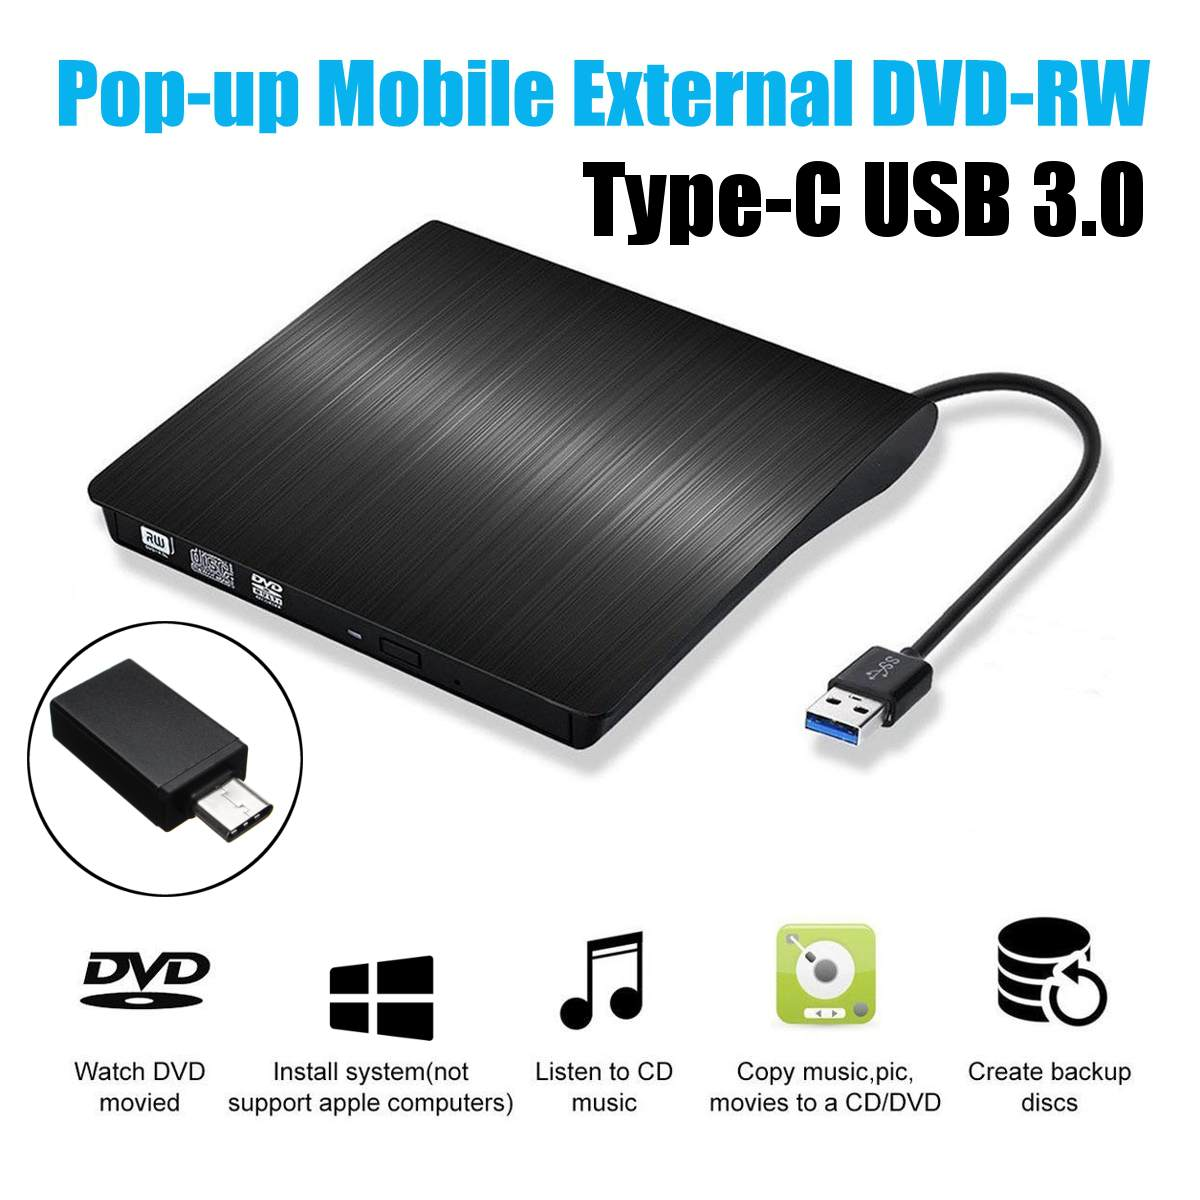 Tipo c usb 3.0 externo dvd/cd/vcd burner rw svcd drive player unidade óptica para mac/pc/apple portátil/os/windows